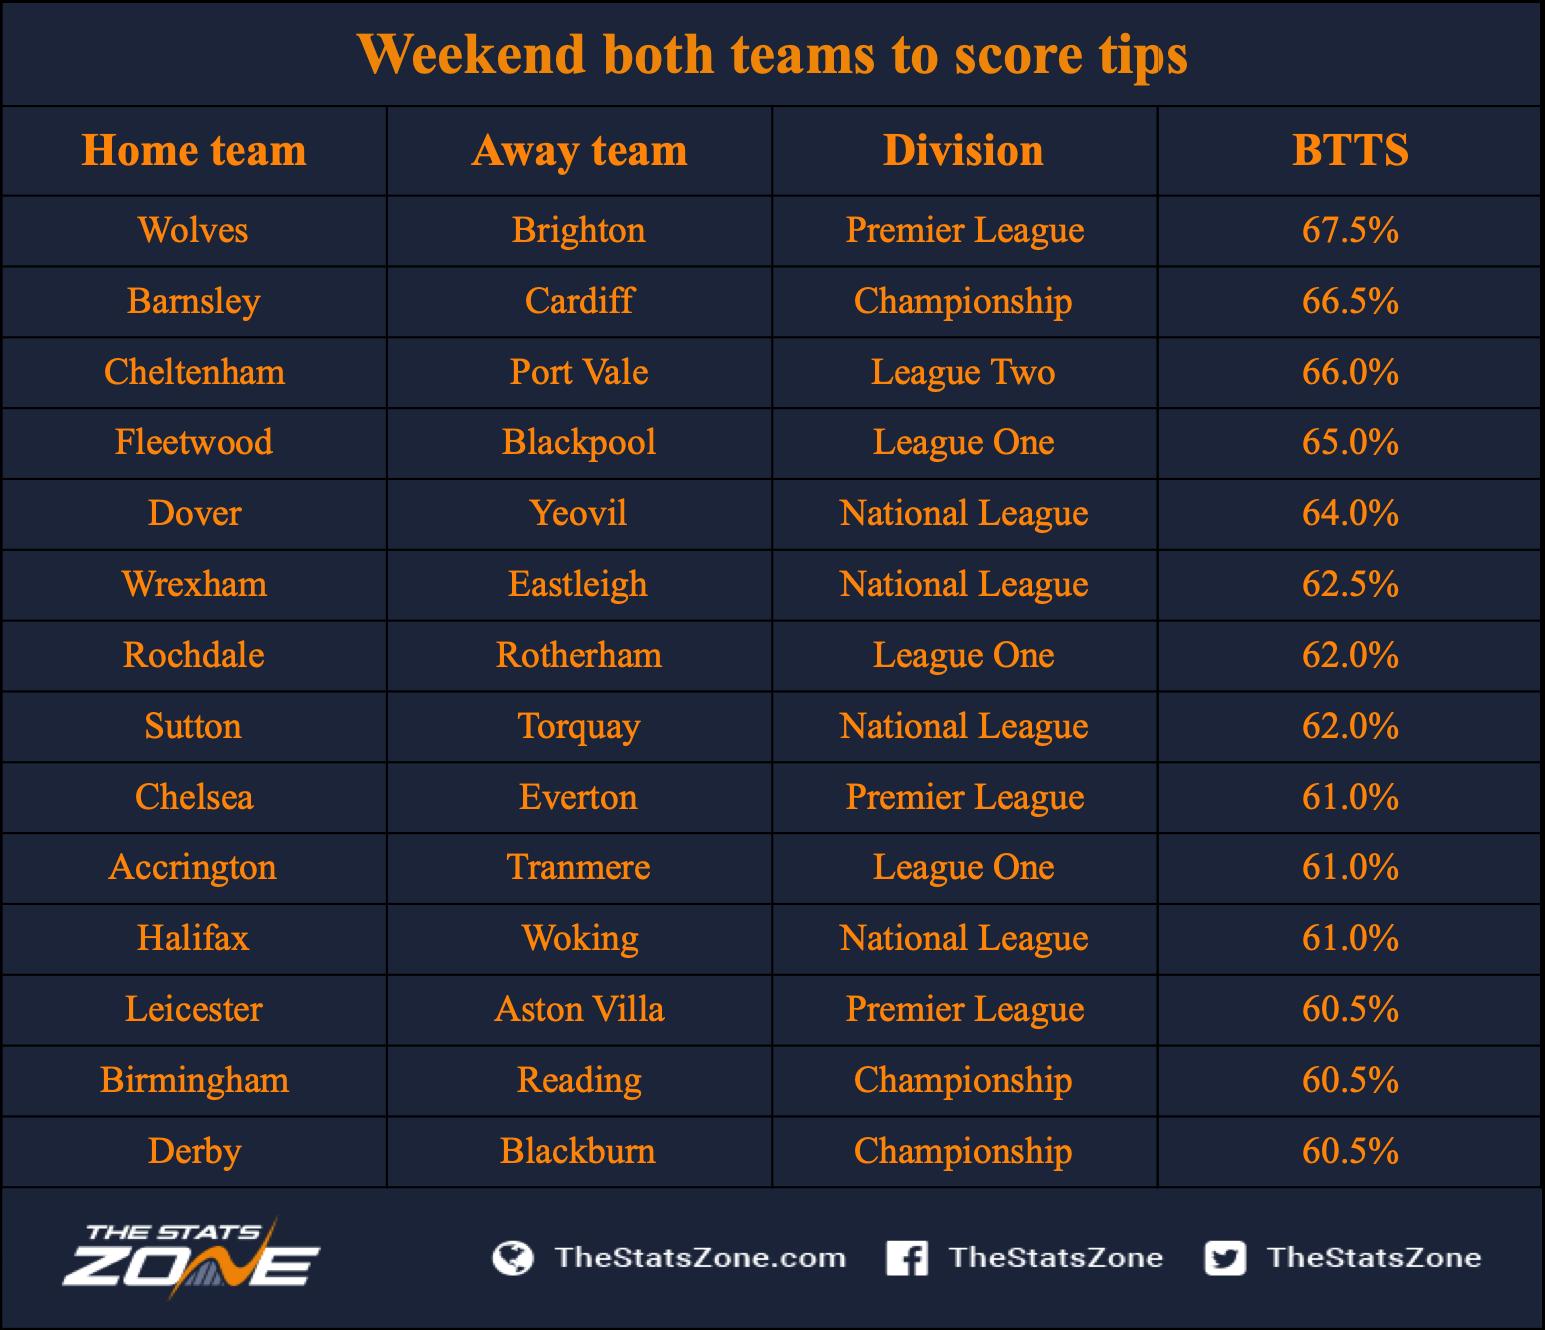 Football betting tips both teams to score stats martin vassallo arguello vs davydenko betting